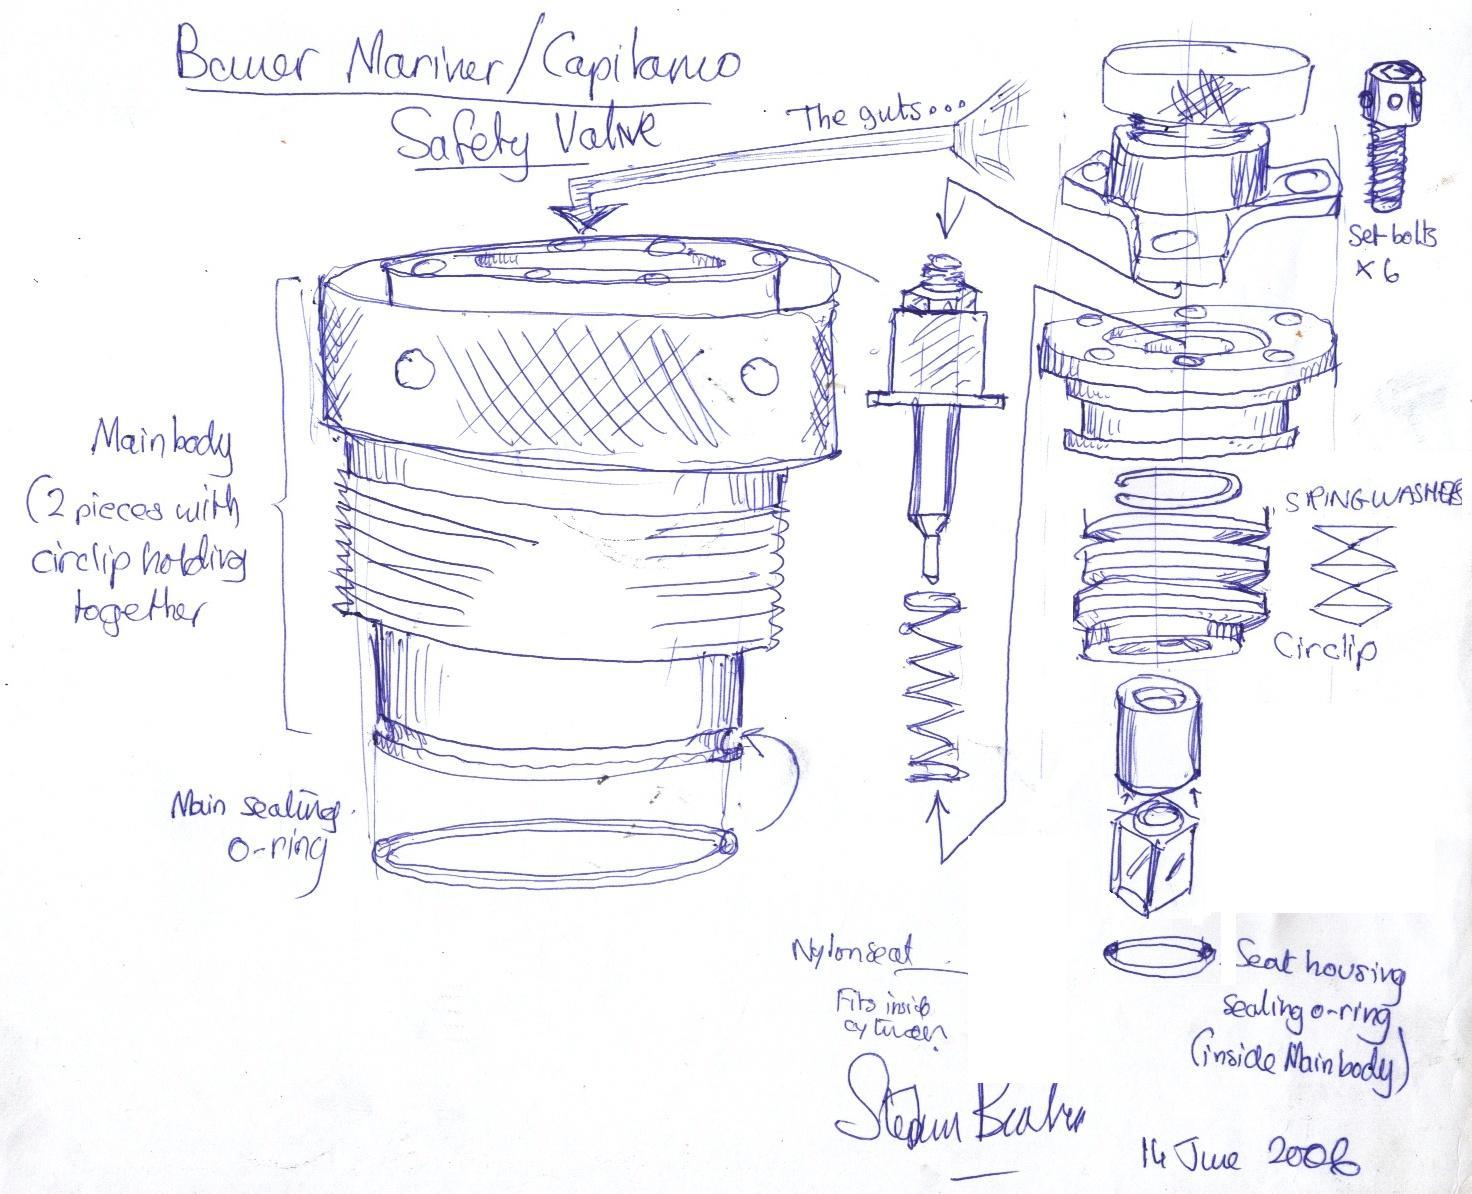 Bauer Compressor Wiring Diagram - 2001 Ford F 150 Heater Fan Wiring Diagrams  for Wiring Diagram Schematics   Bauer Compressor Wiring Diagram      Wiring Diagram Schematics